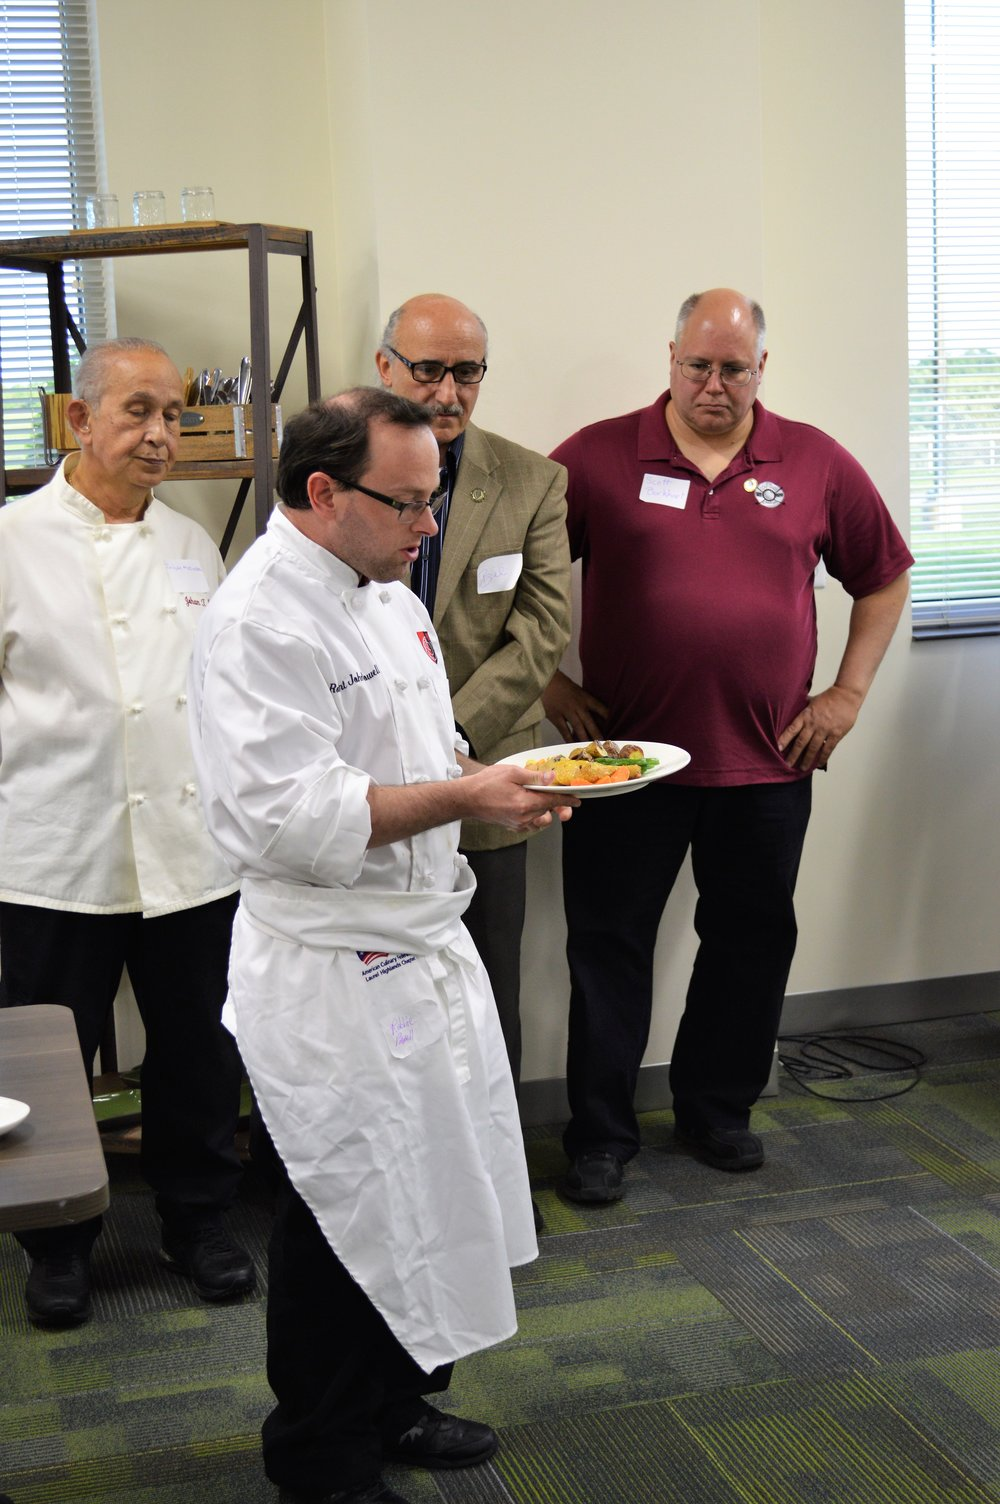 Robbie Powell presenting his dish.JPG